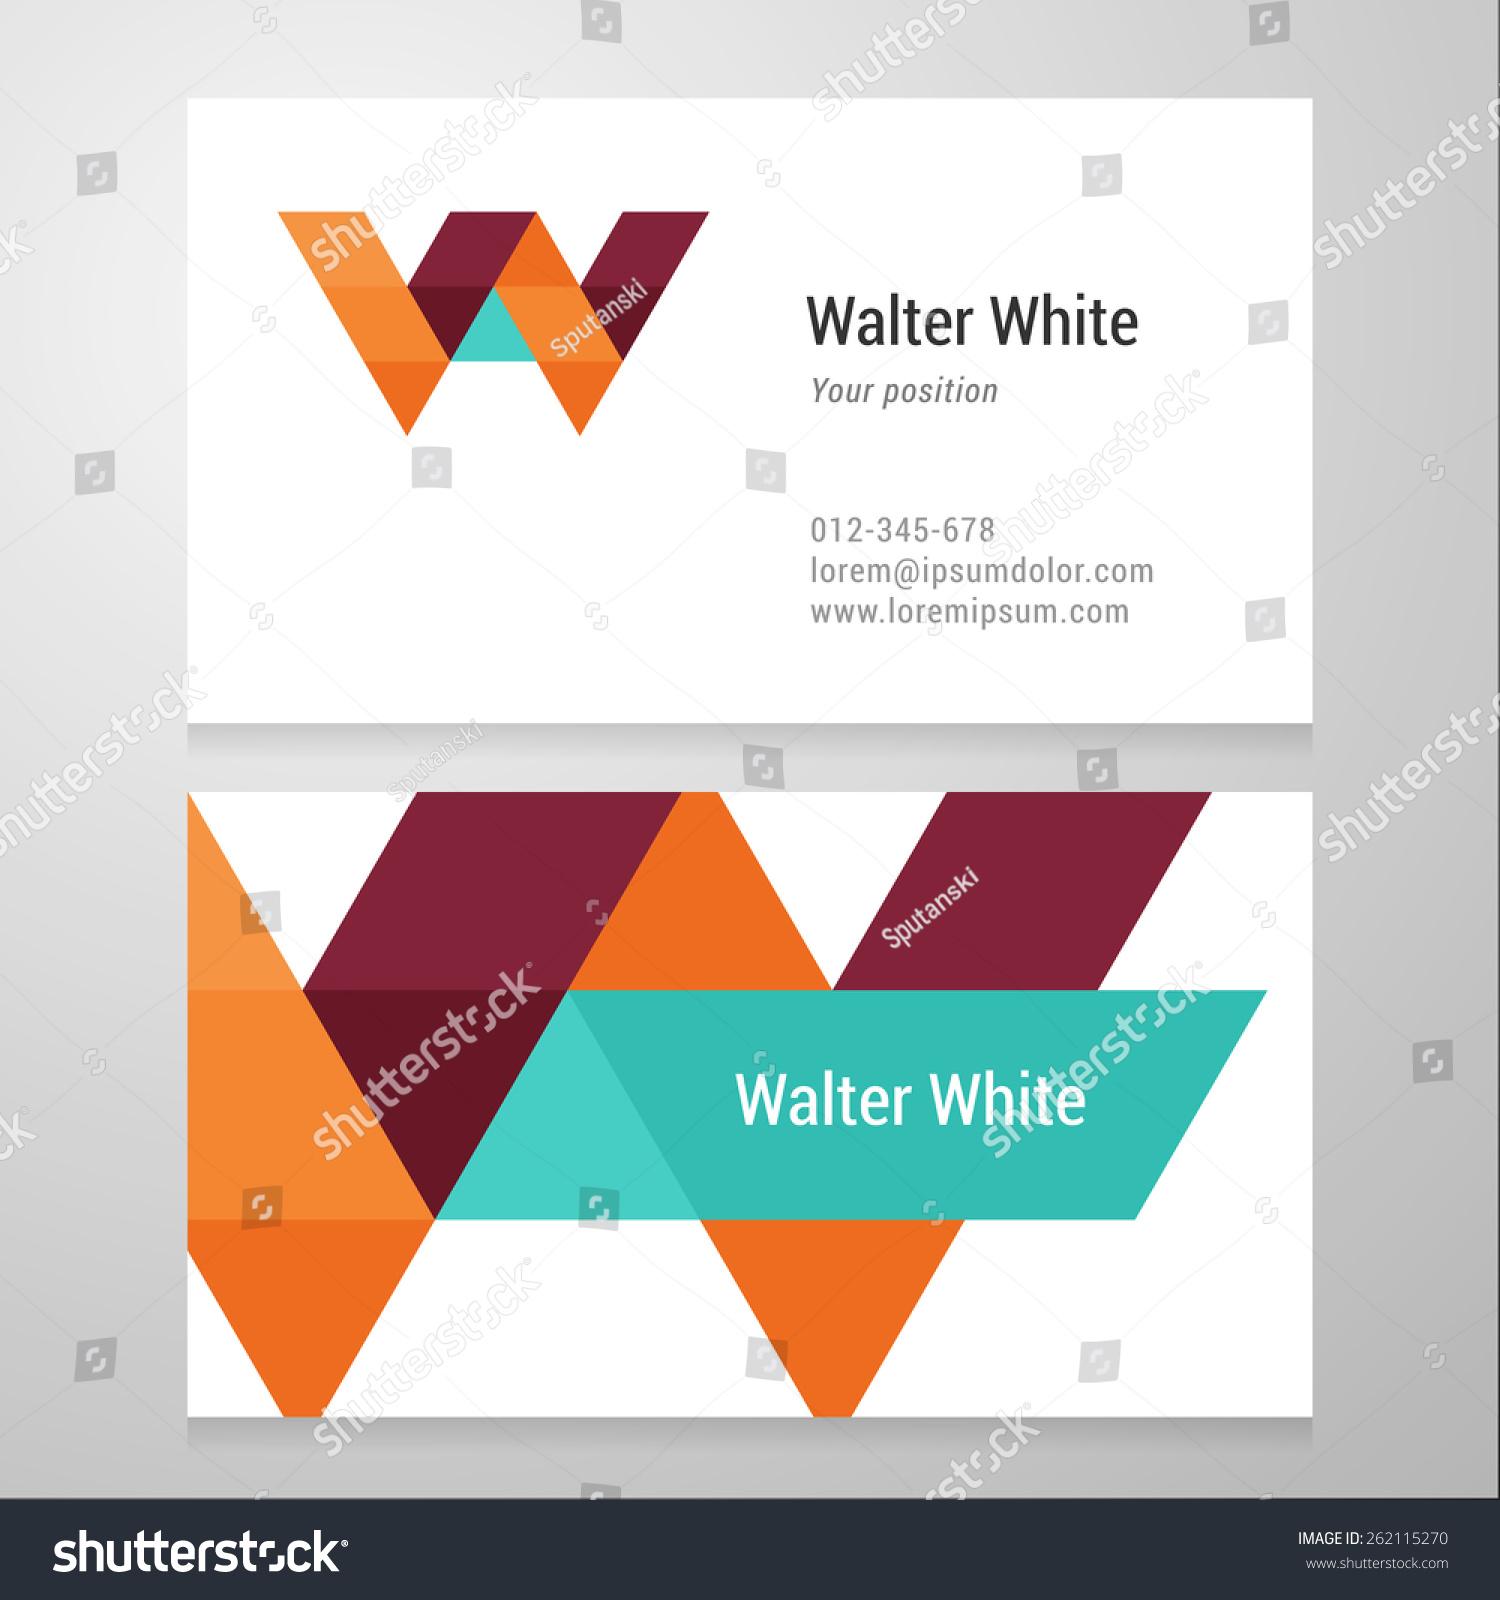 free printable business cards ac plishment resume examples